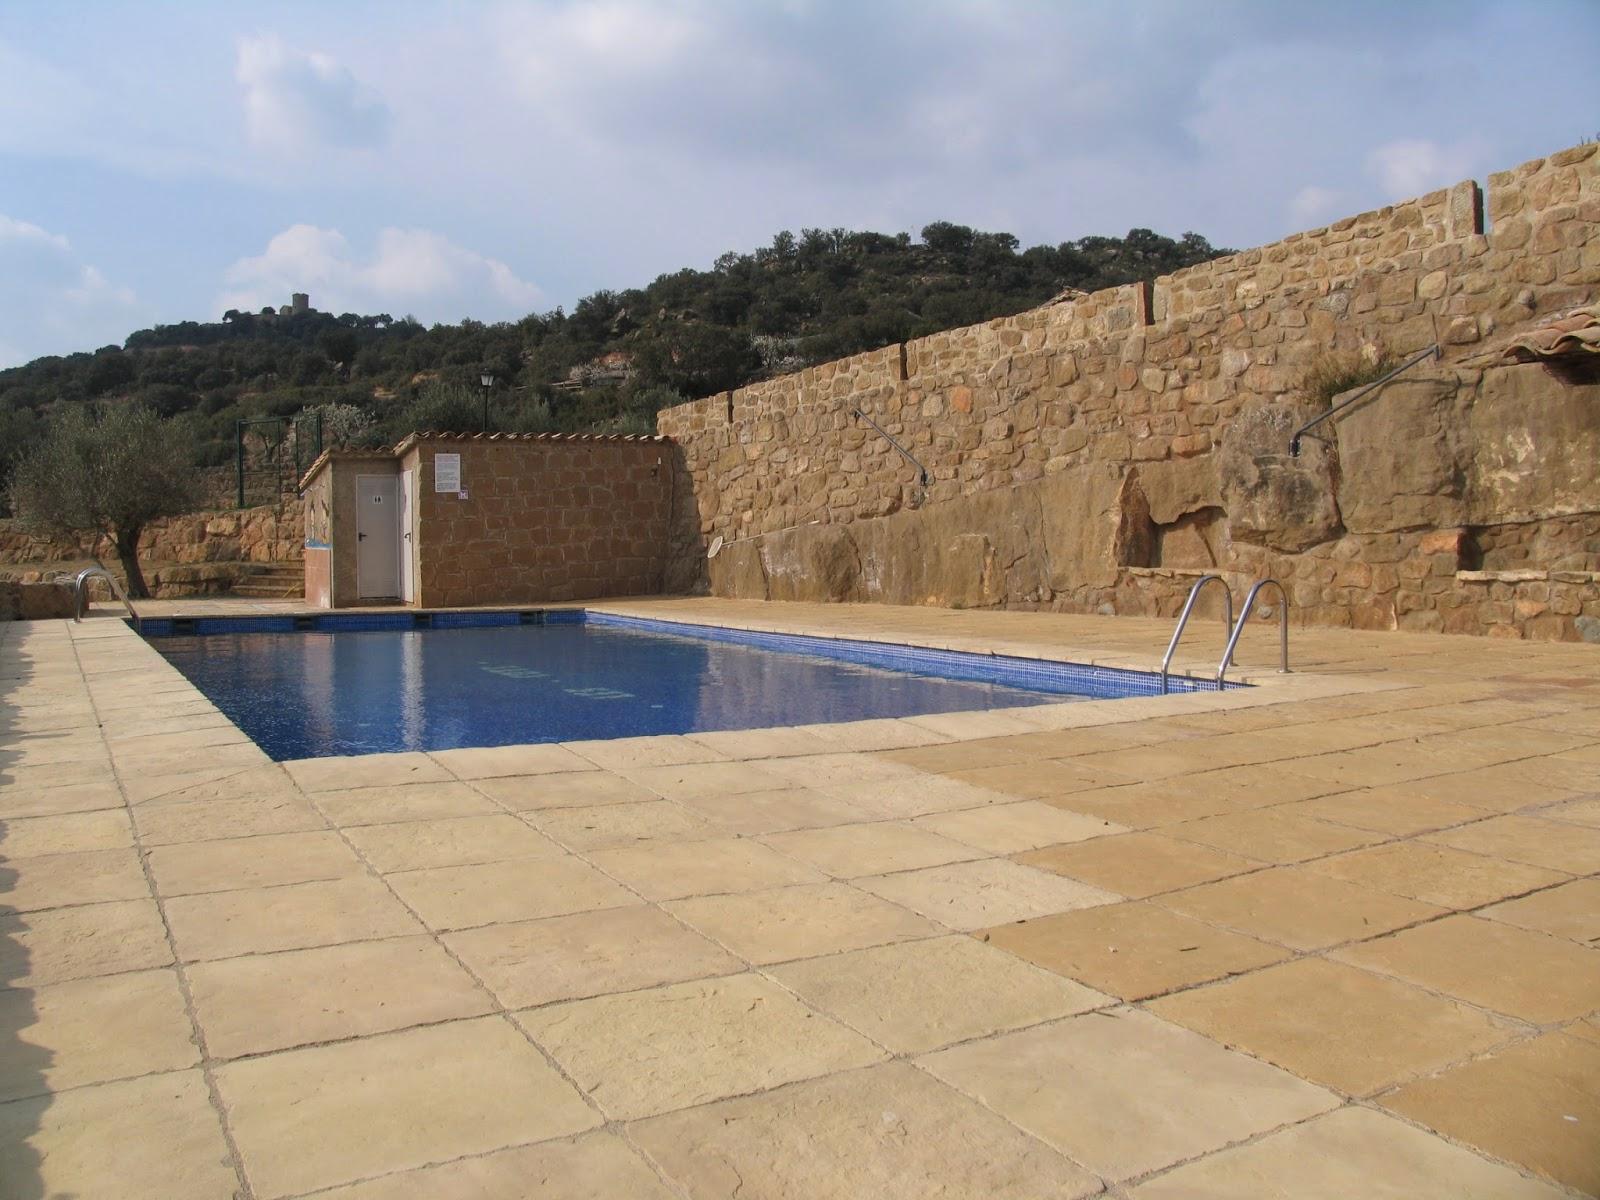 Ruralverd casa rural lloberola segarra 33208 for Casa rural catalunya piscina